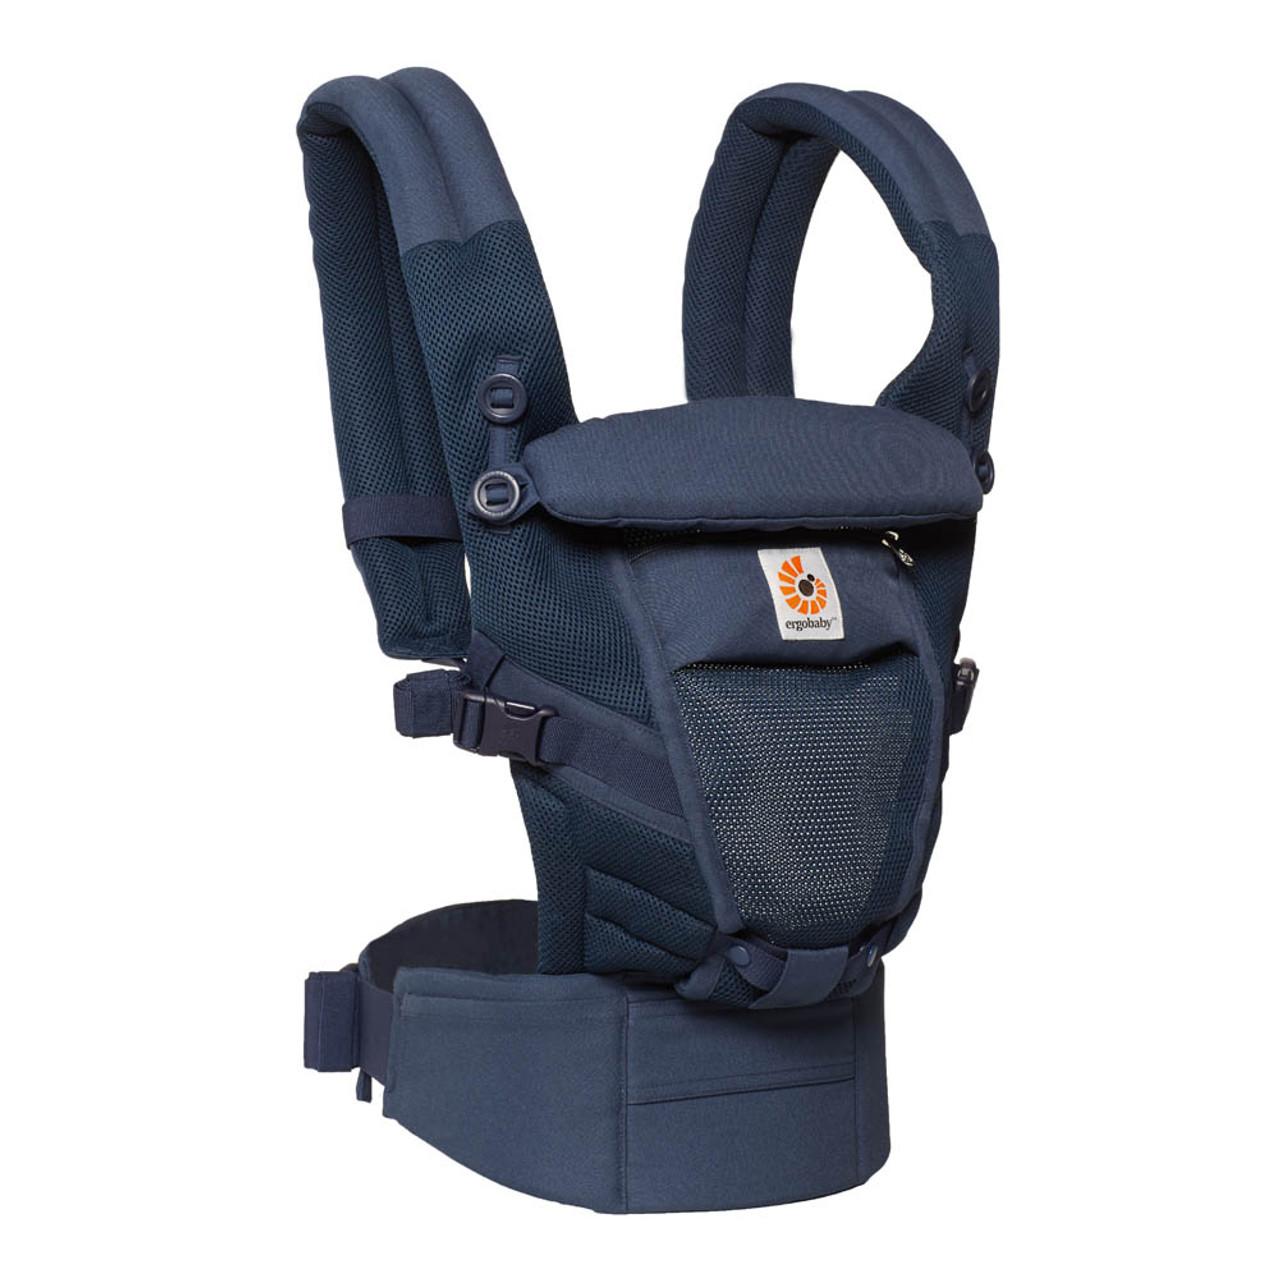 d657a3036b1 Ergobaby Adapt Cool Air Mesh Baby Carrier - Deep Blue - Dear-Born Baby